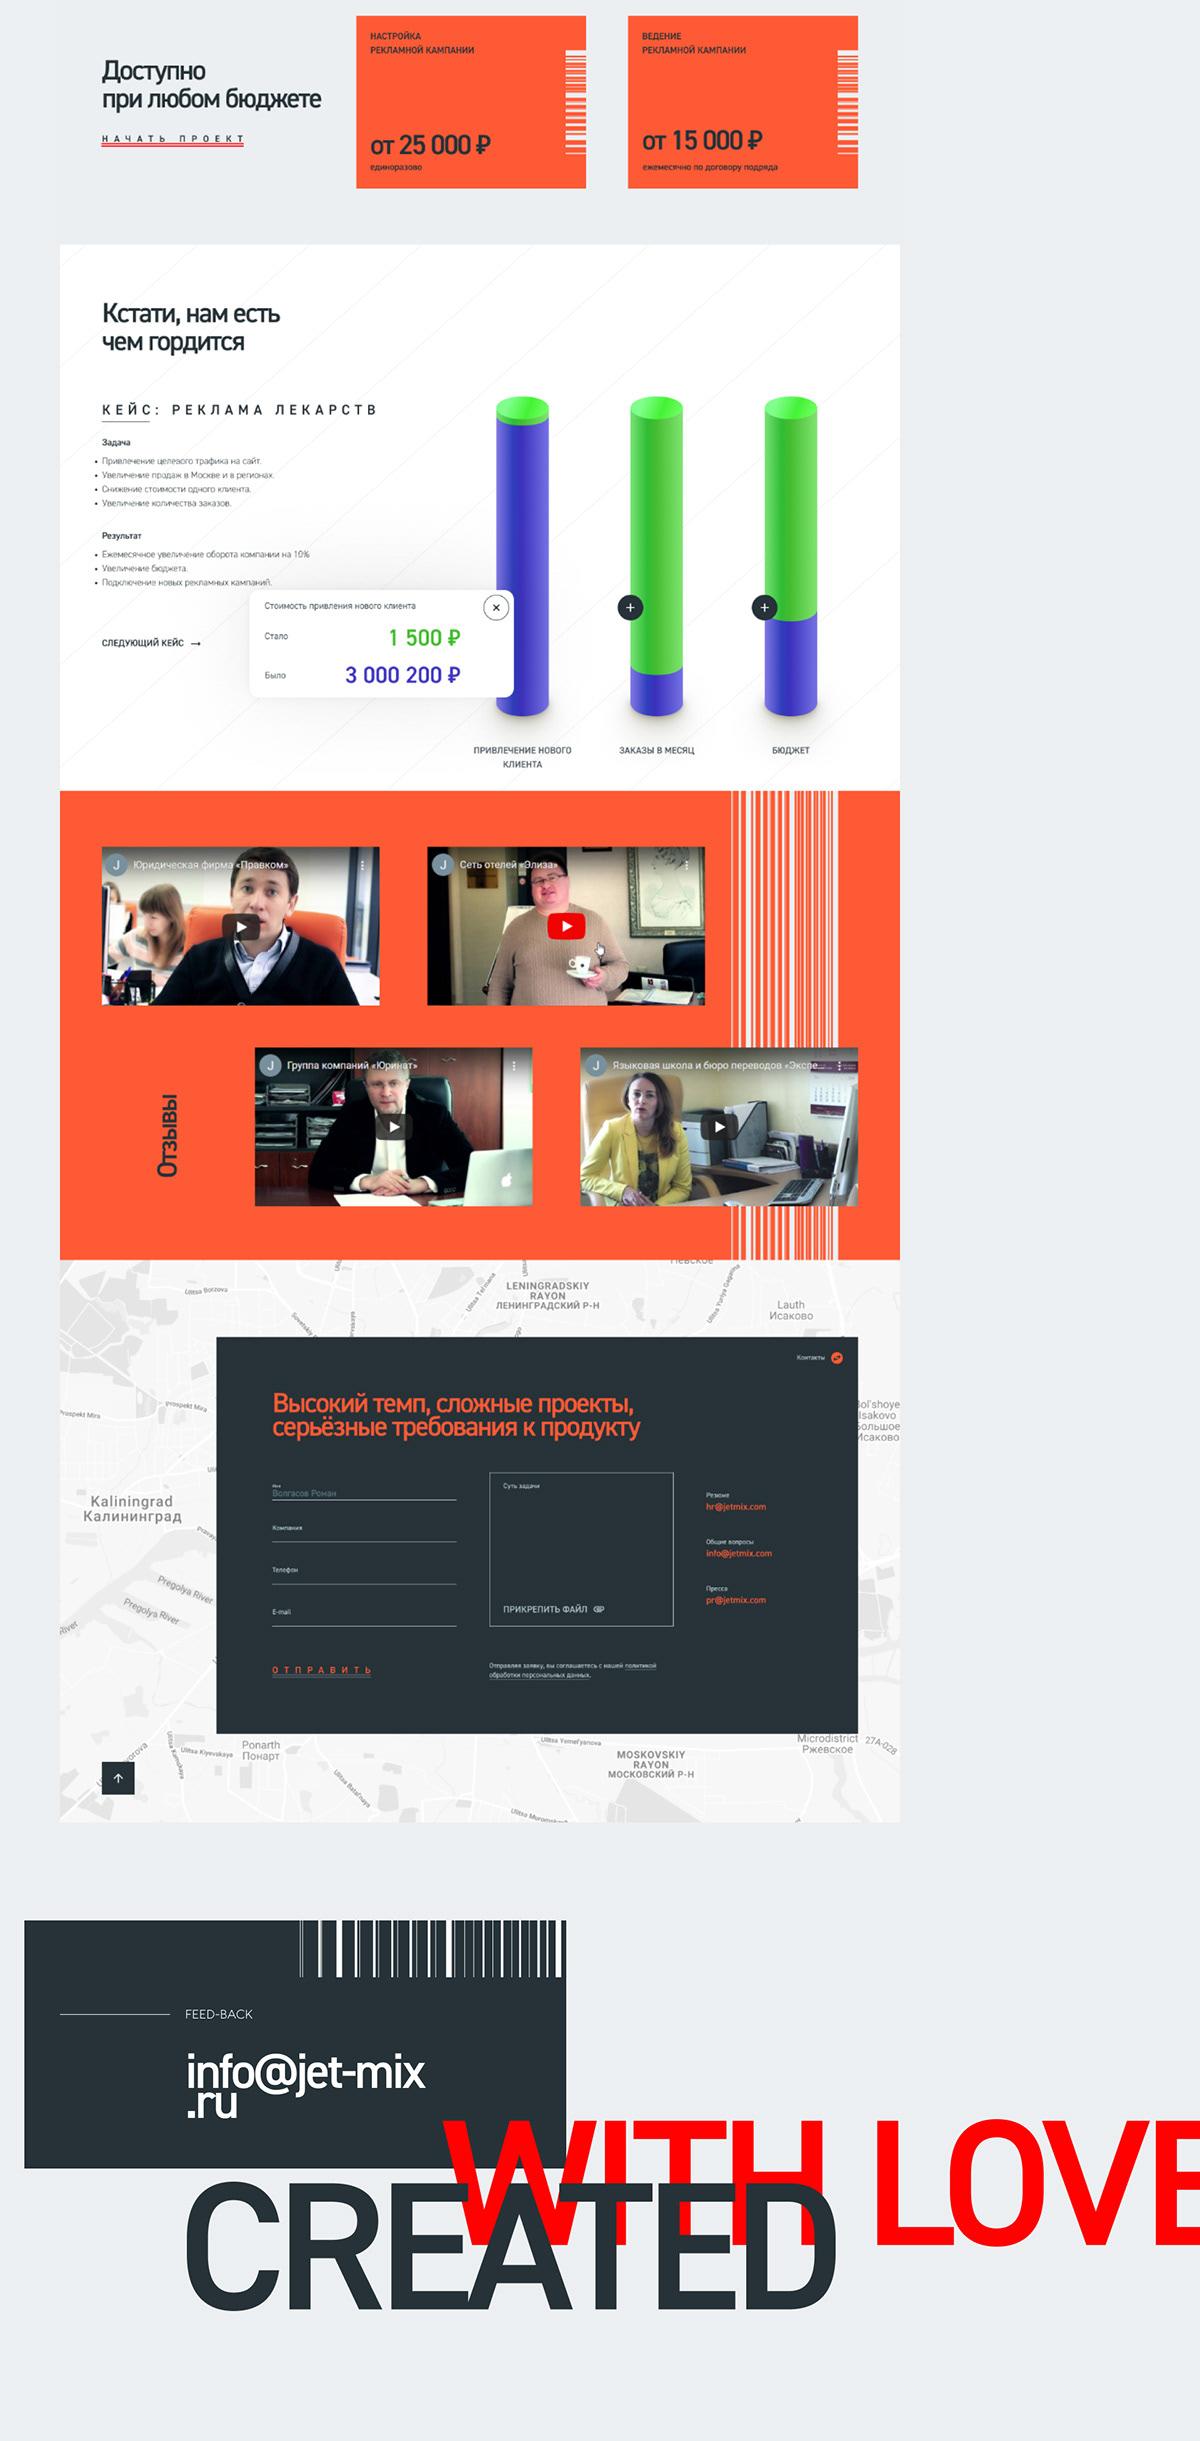 landing promo промо ads context Promotion SEO Website Design контекстная реклама реклама